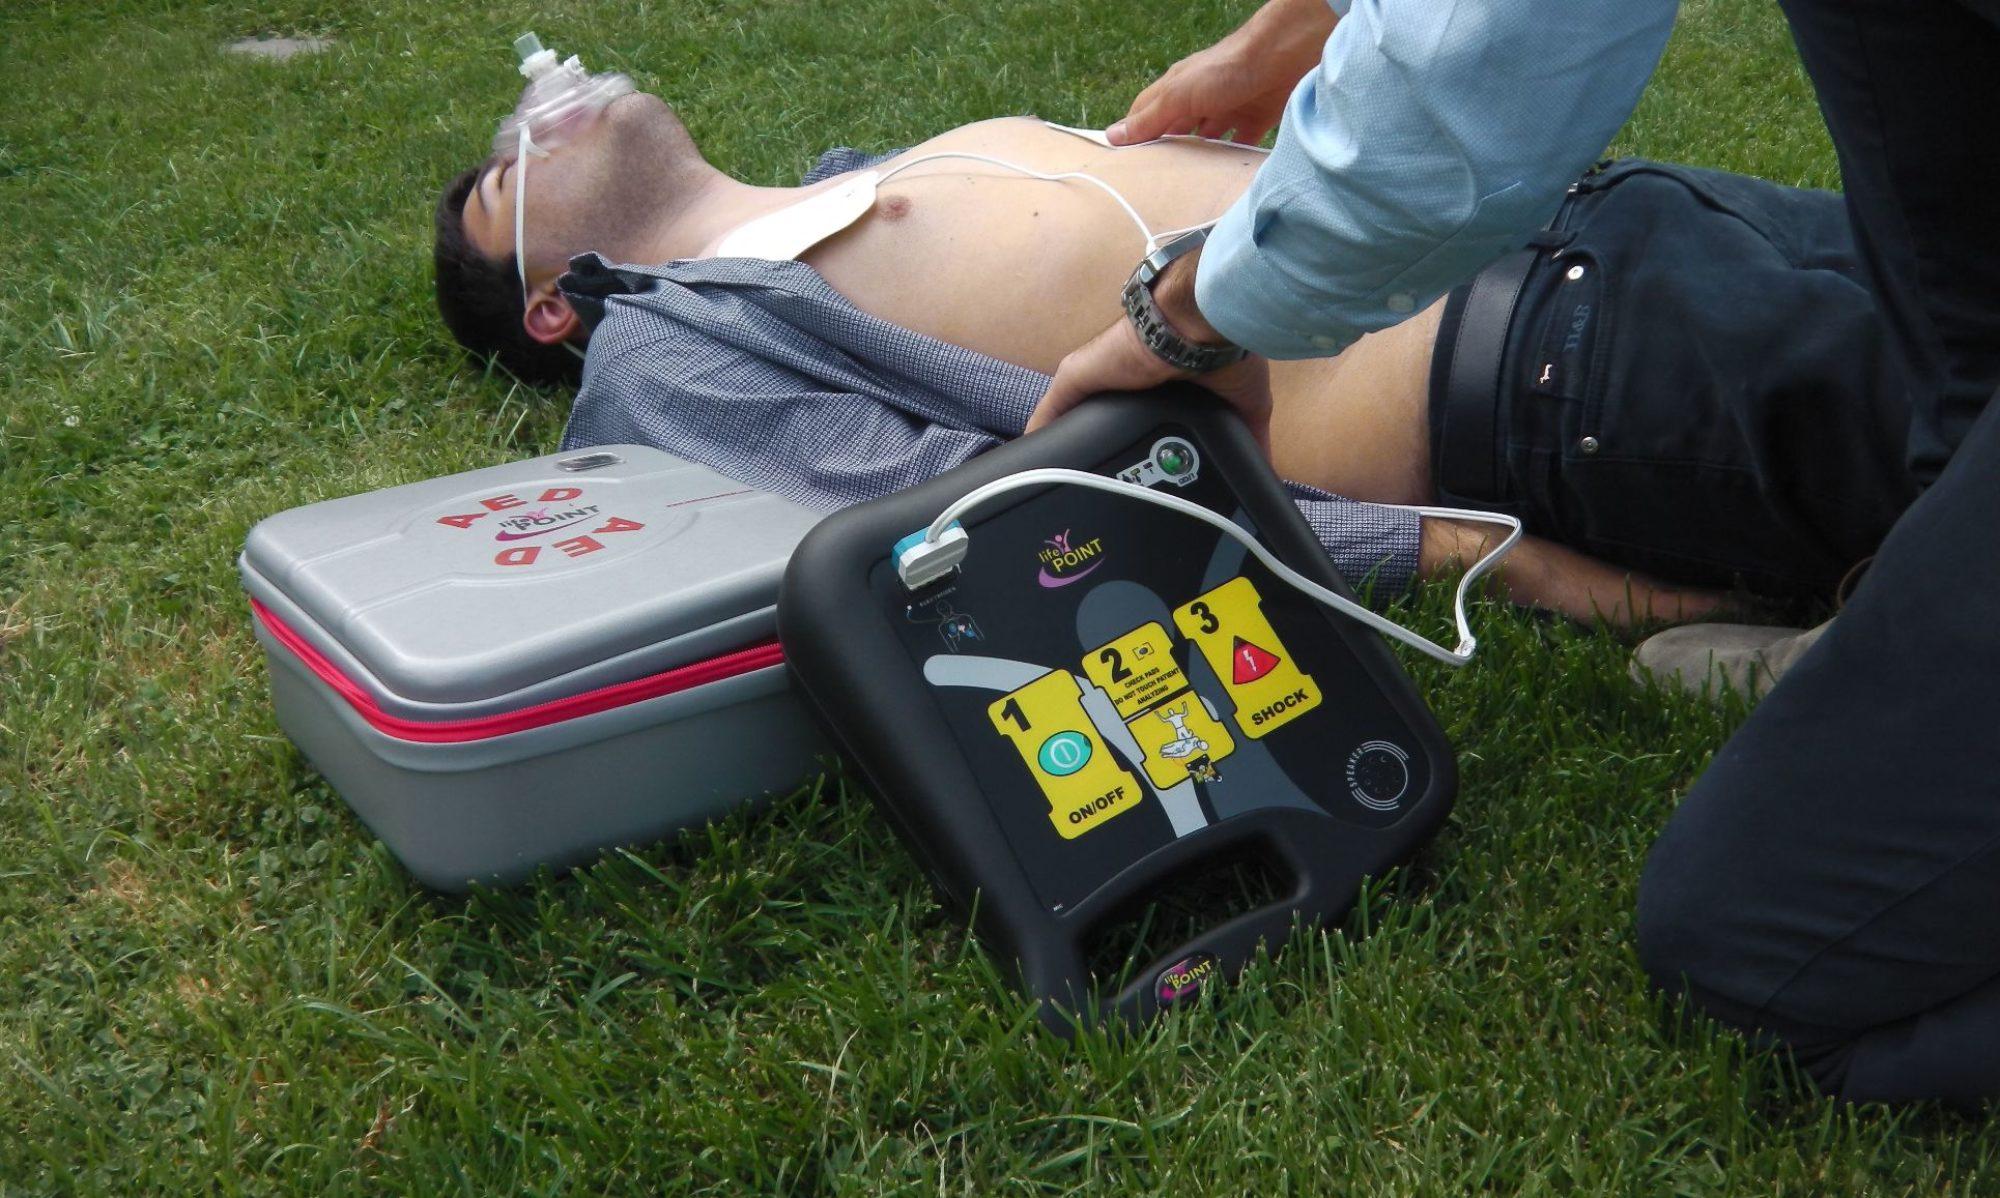 Importanta unui defibrilator in locuri publice si la serviciu